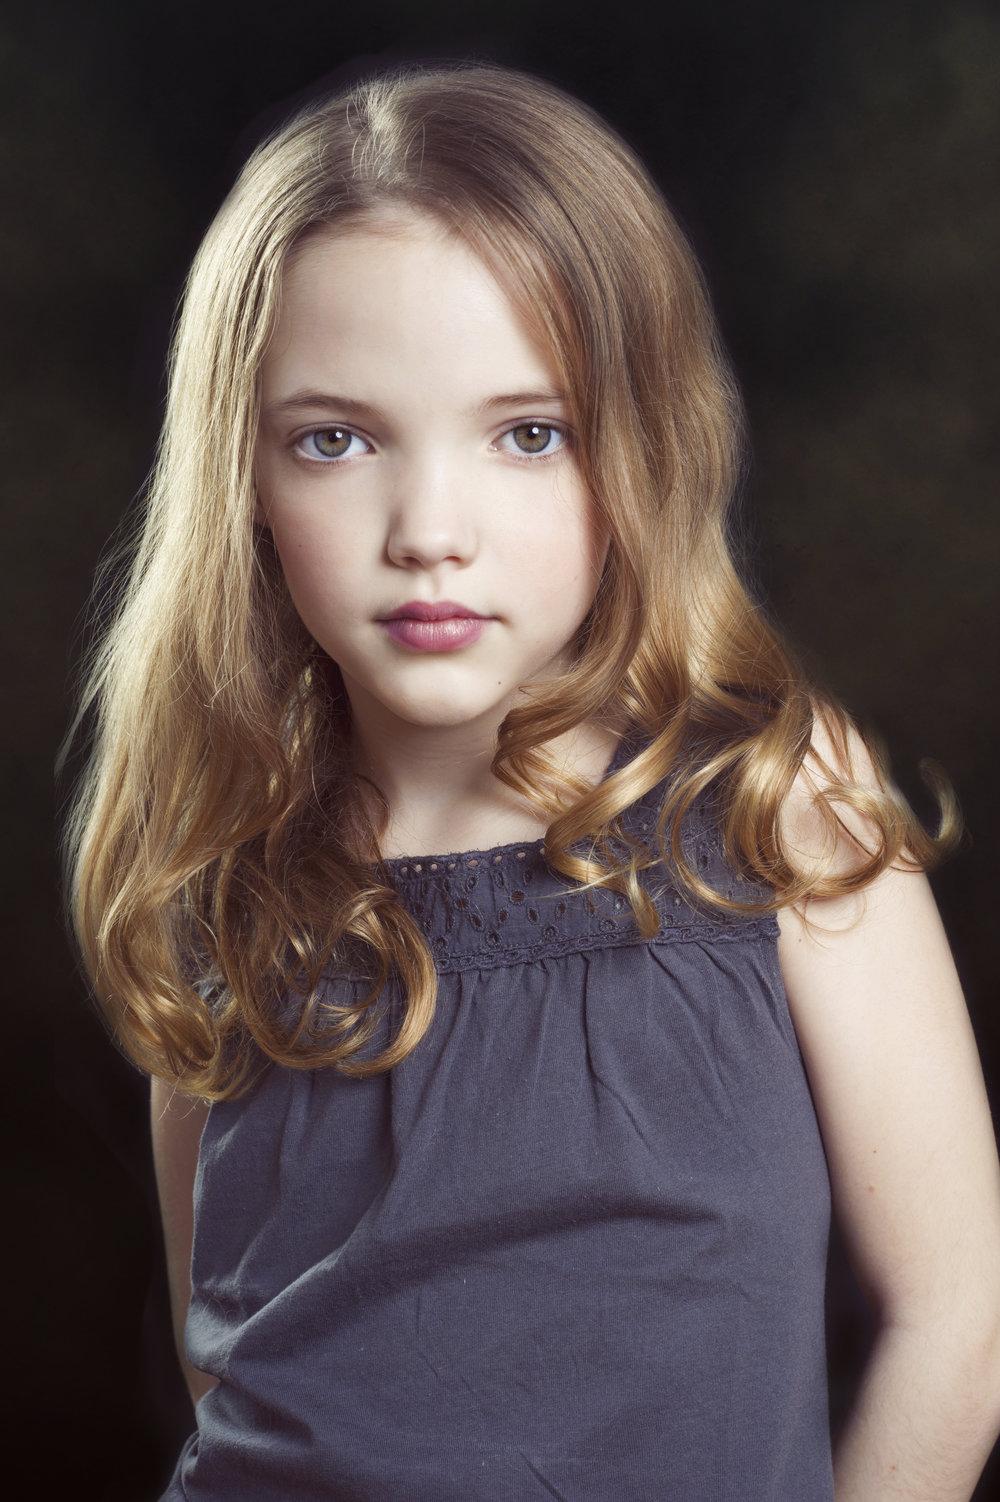 Marta-Hewson-Classical-portrait-Annalise-Forbes.jpg